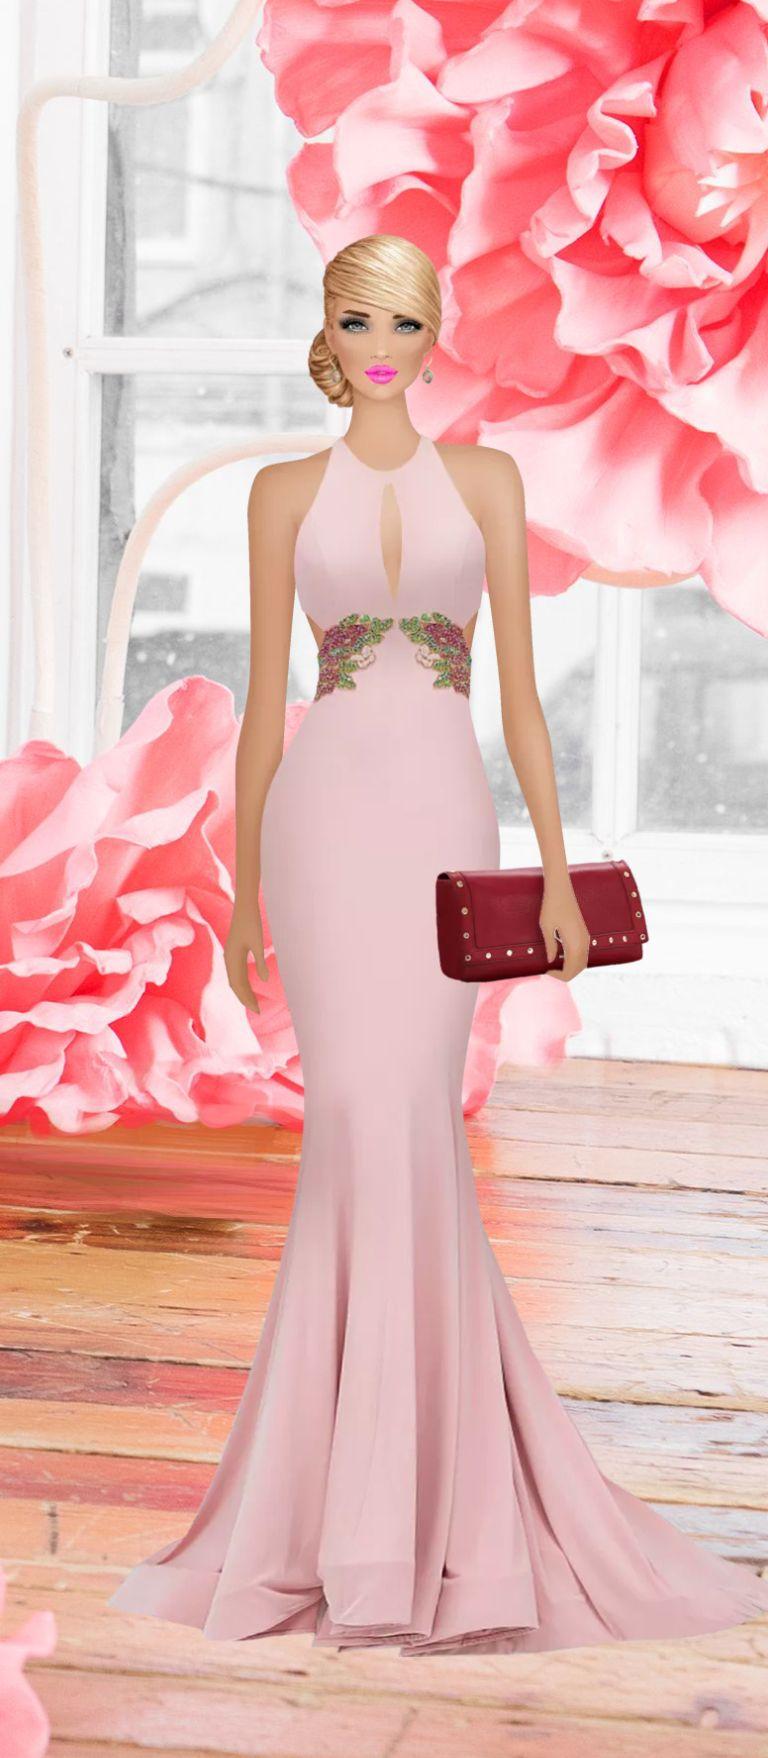 Pin de Aseret phoenix en Fashion Game | Pinterest | Moda ilustración ...